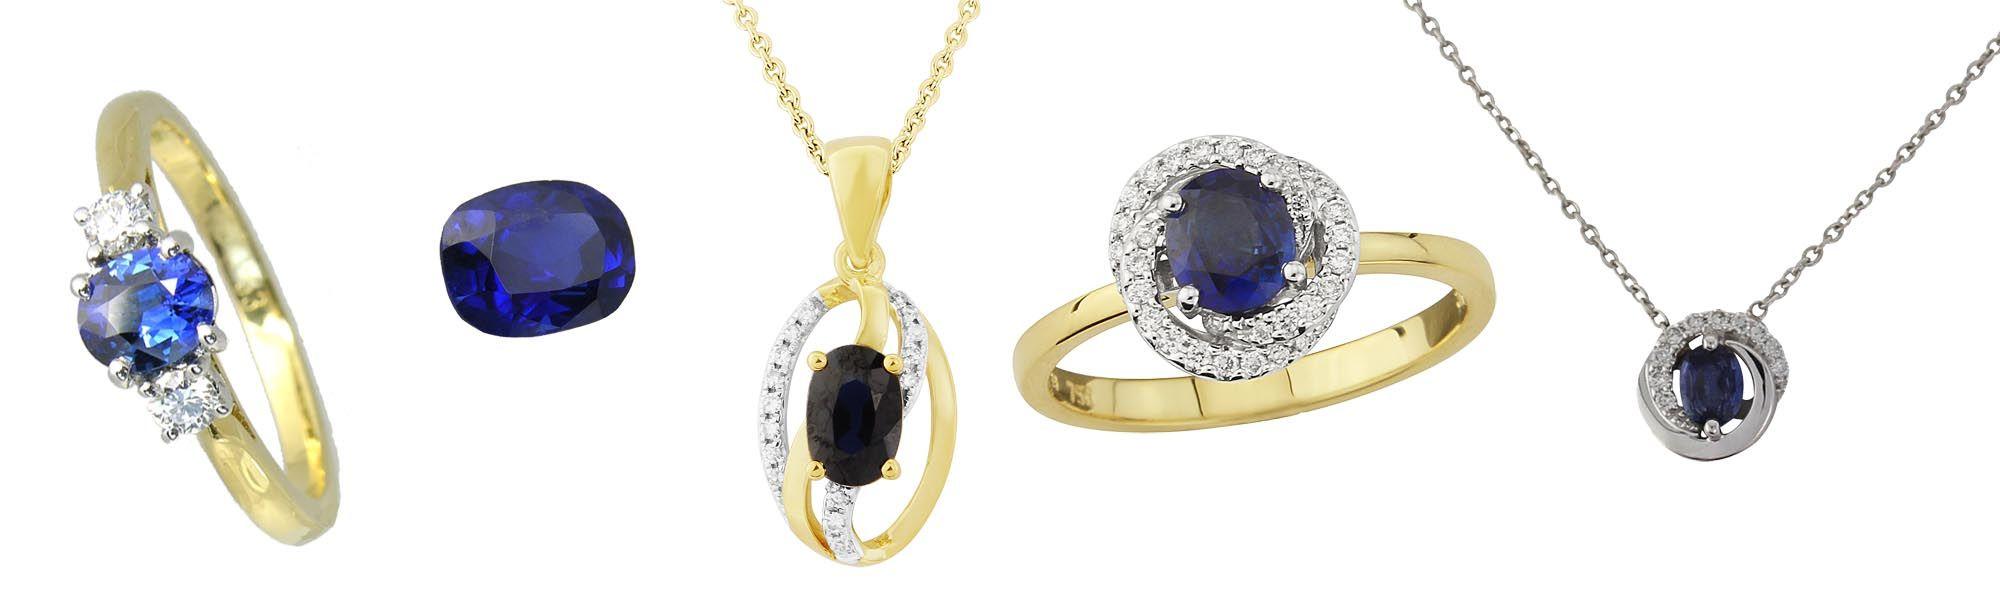 Peridot Sally Thornton Blog from Thorntons Jewellers Kettering Northampton